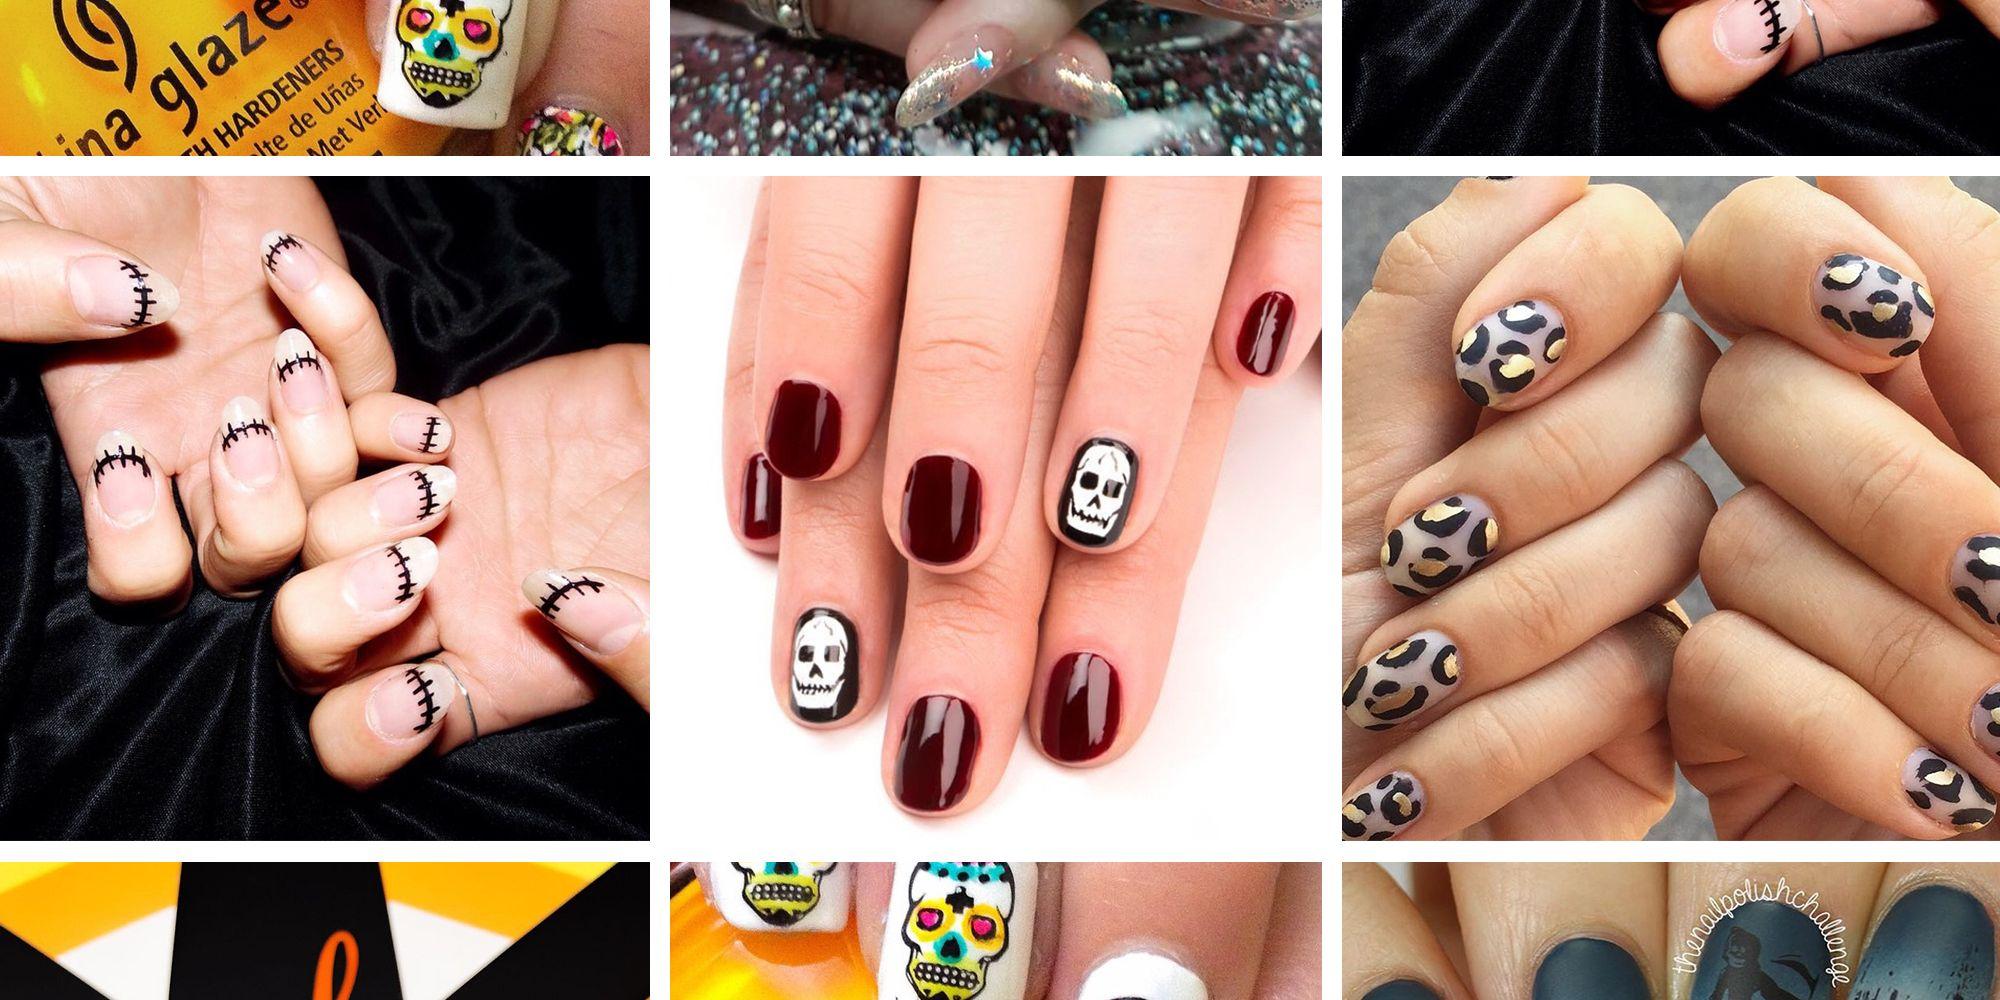 11 Best Halloween Nail Ideas & Inspiration 2018 - Halloween Nail Art ...